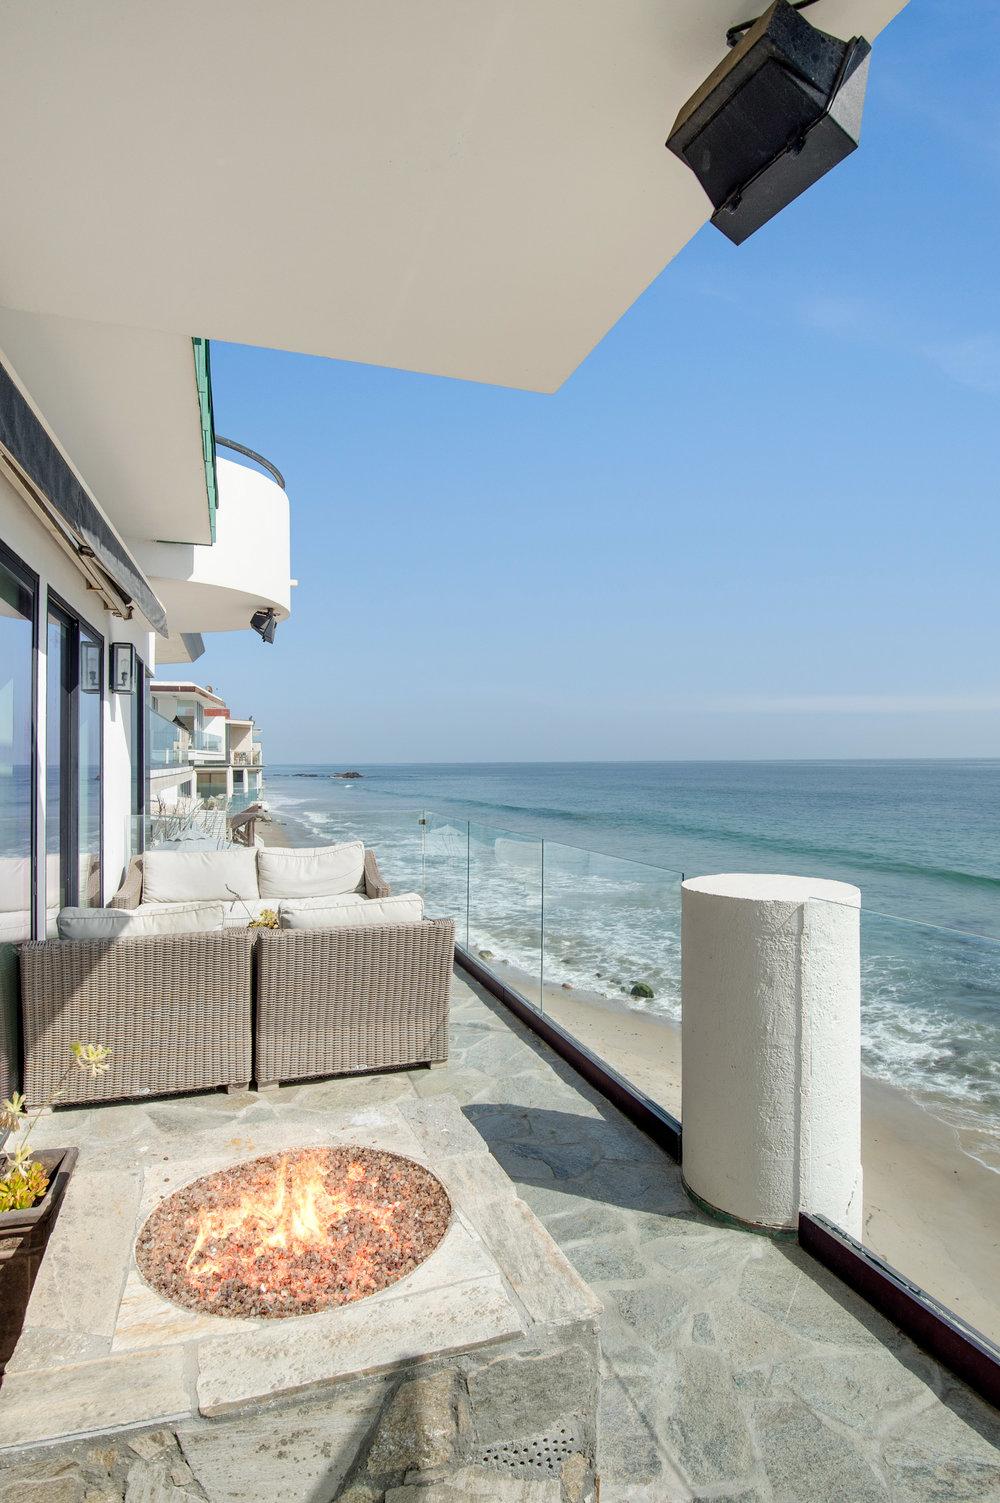 015 Deck 25252 Malibu Road For Sale Lease The Malibu Life Team Luxury Real Estate.jpg